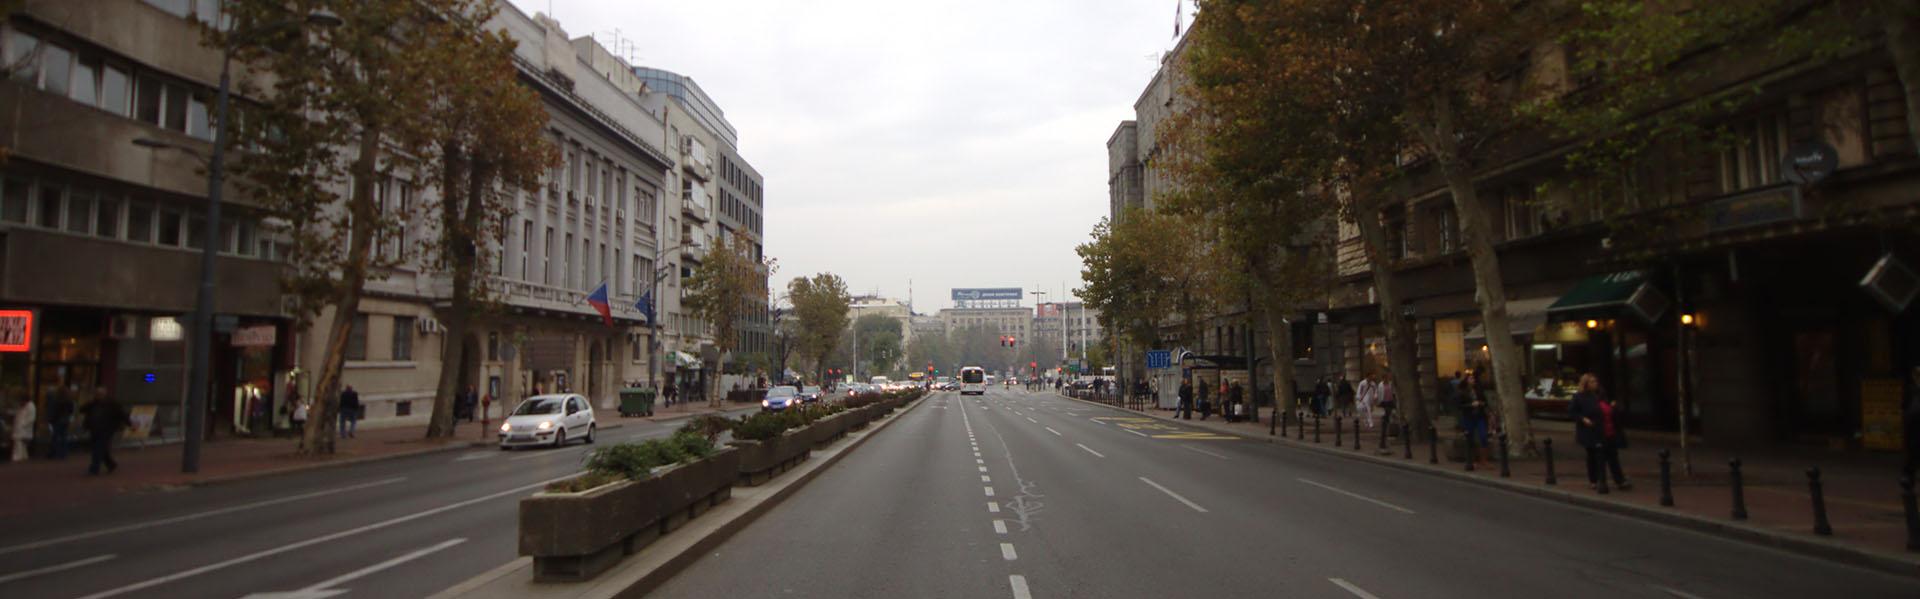 Dostava hrane Lipov lad | Beograd